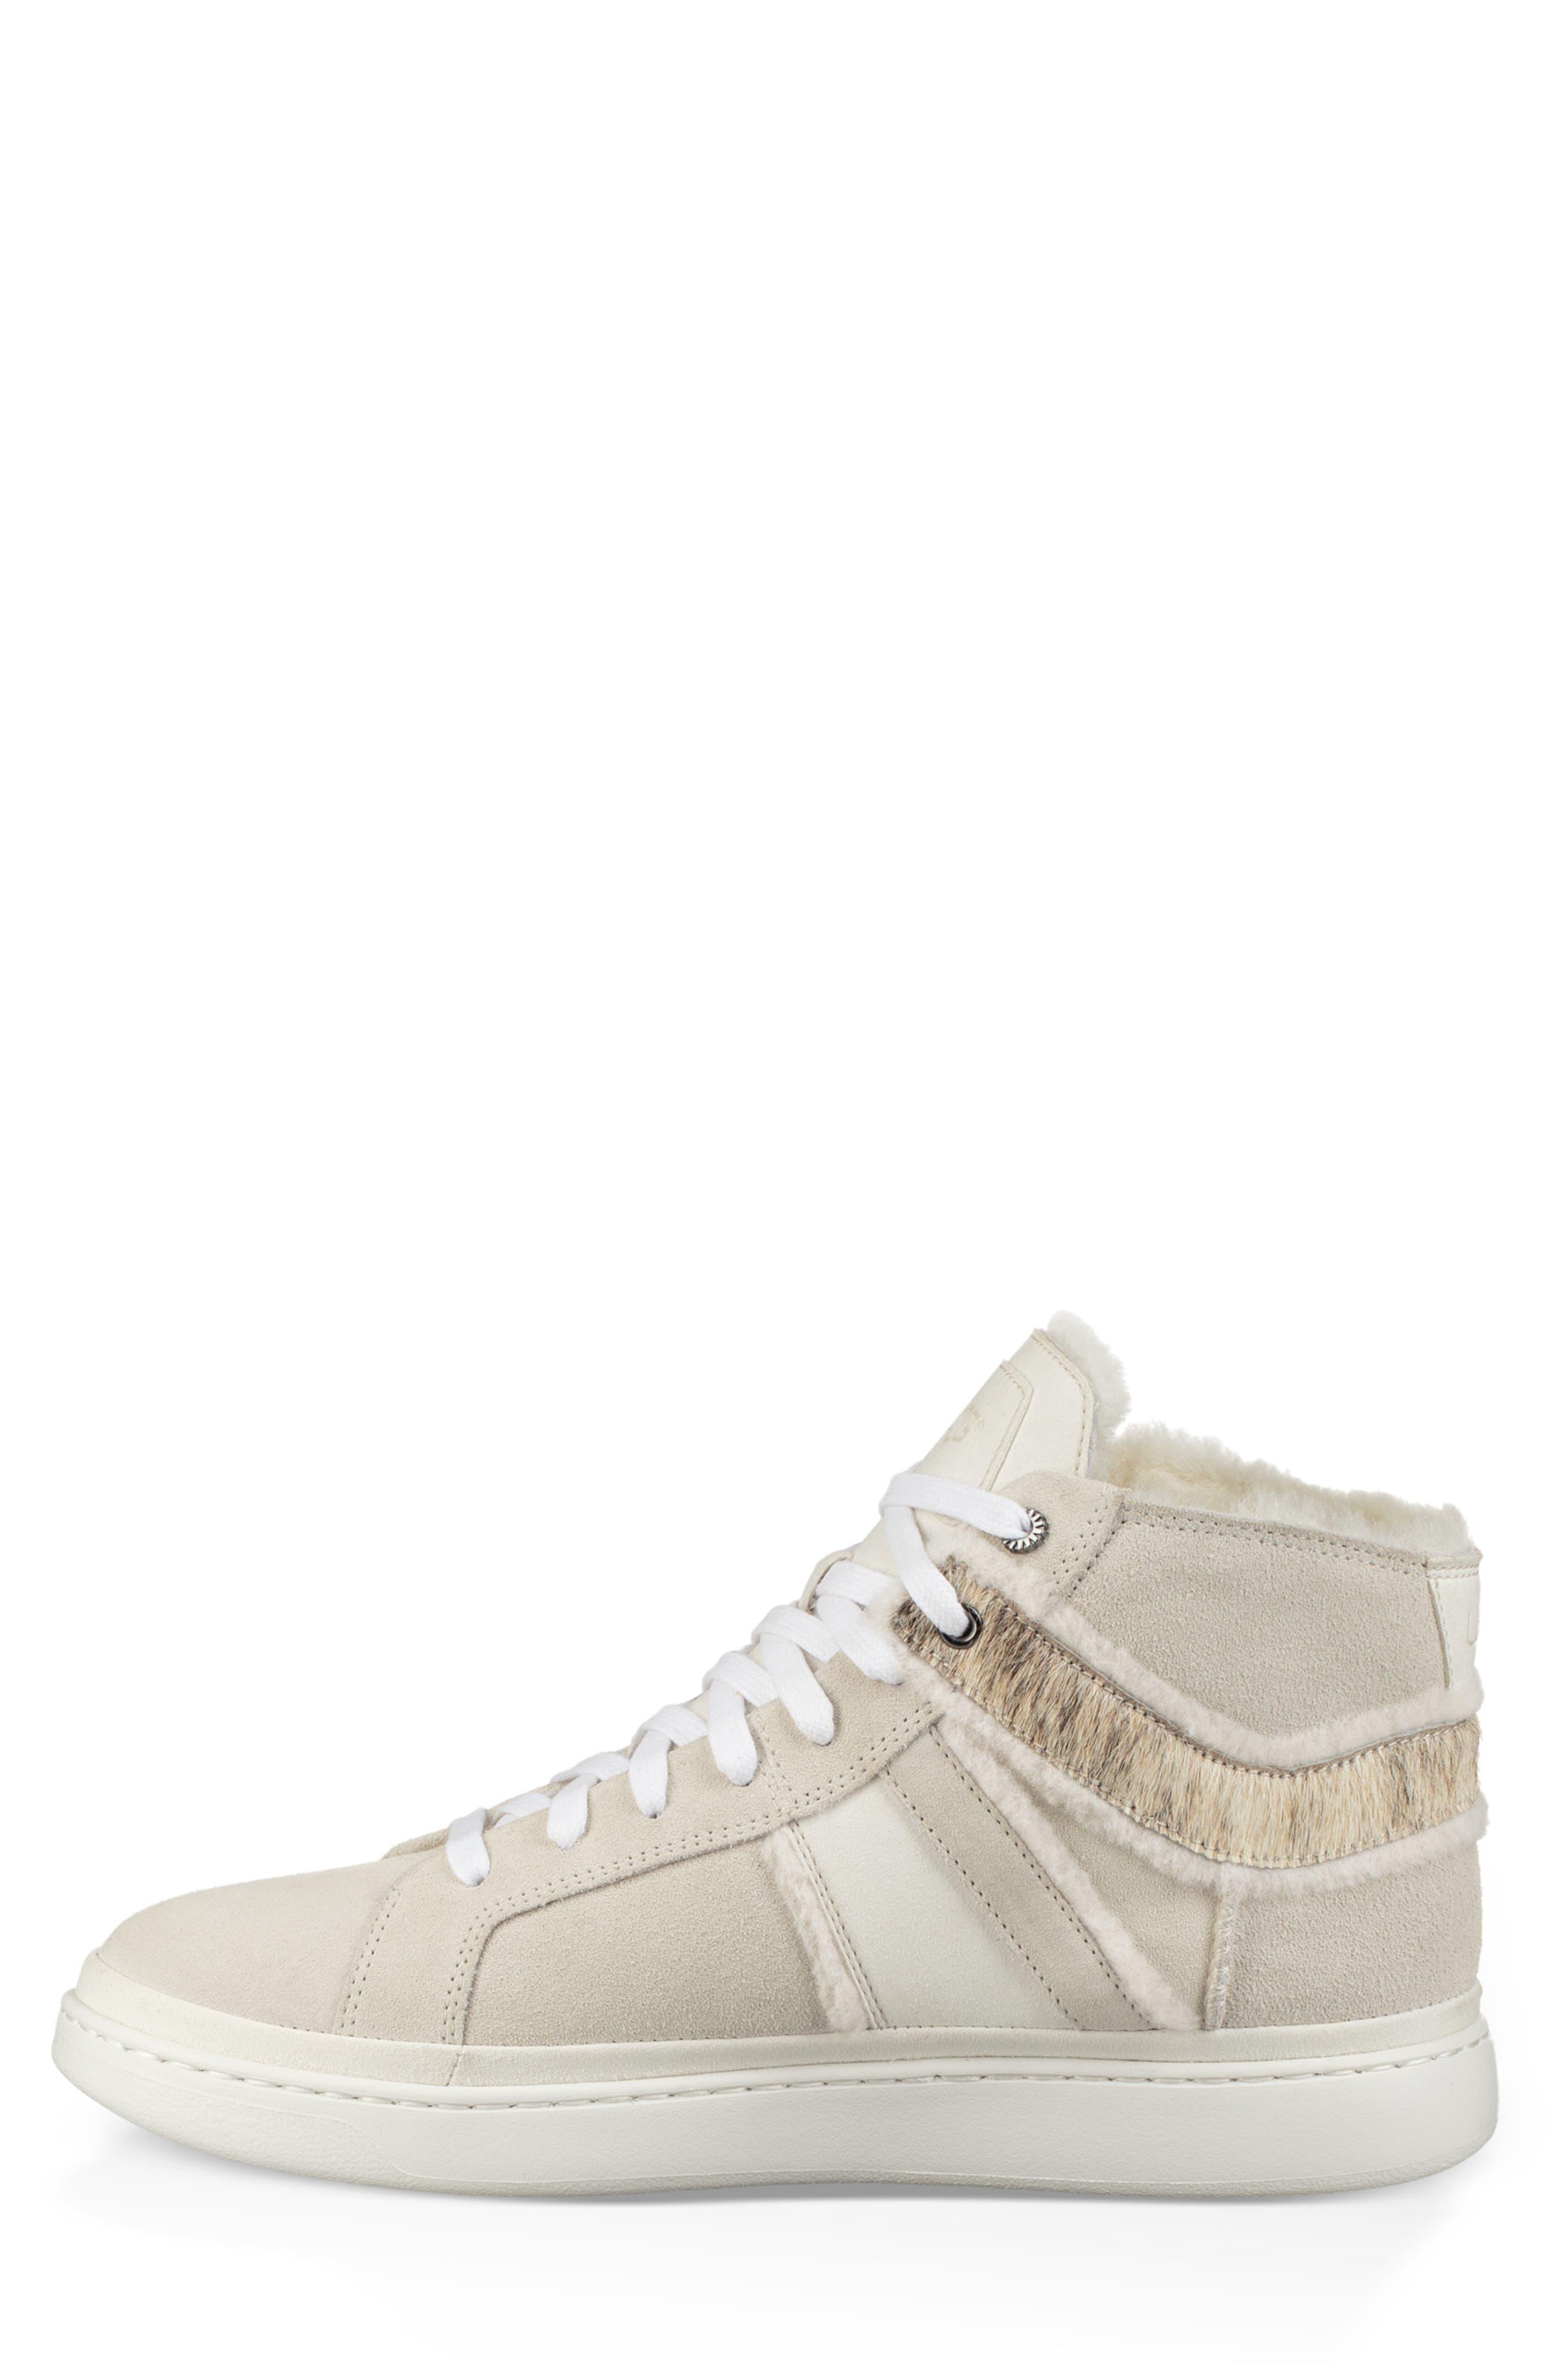 Cali High Top Sneaker,                             Alternate thumbnail 3, color,                             WHITE